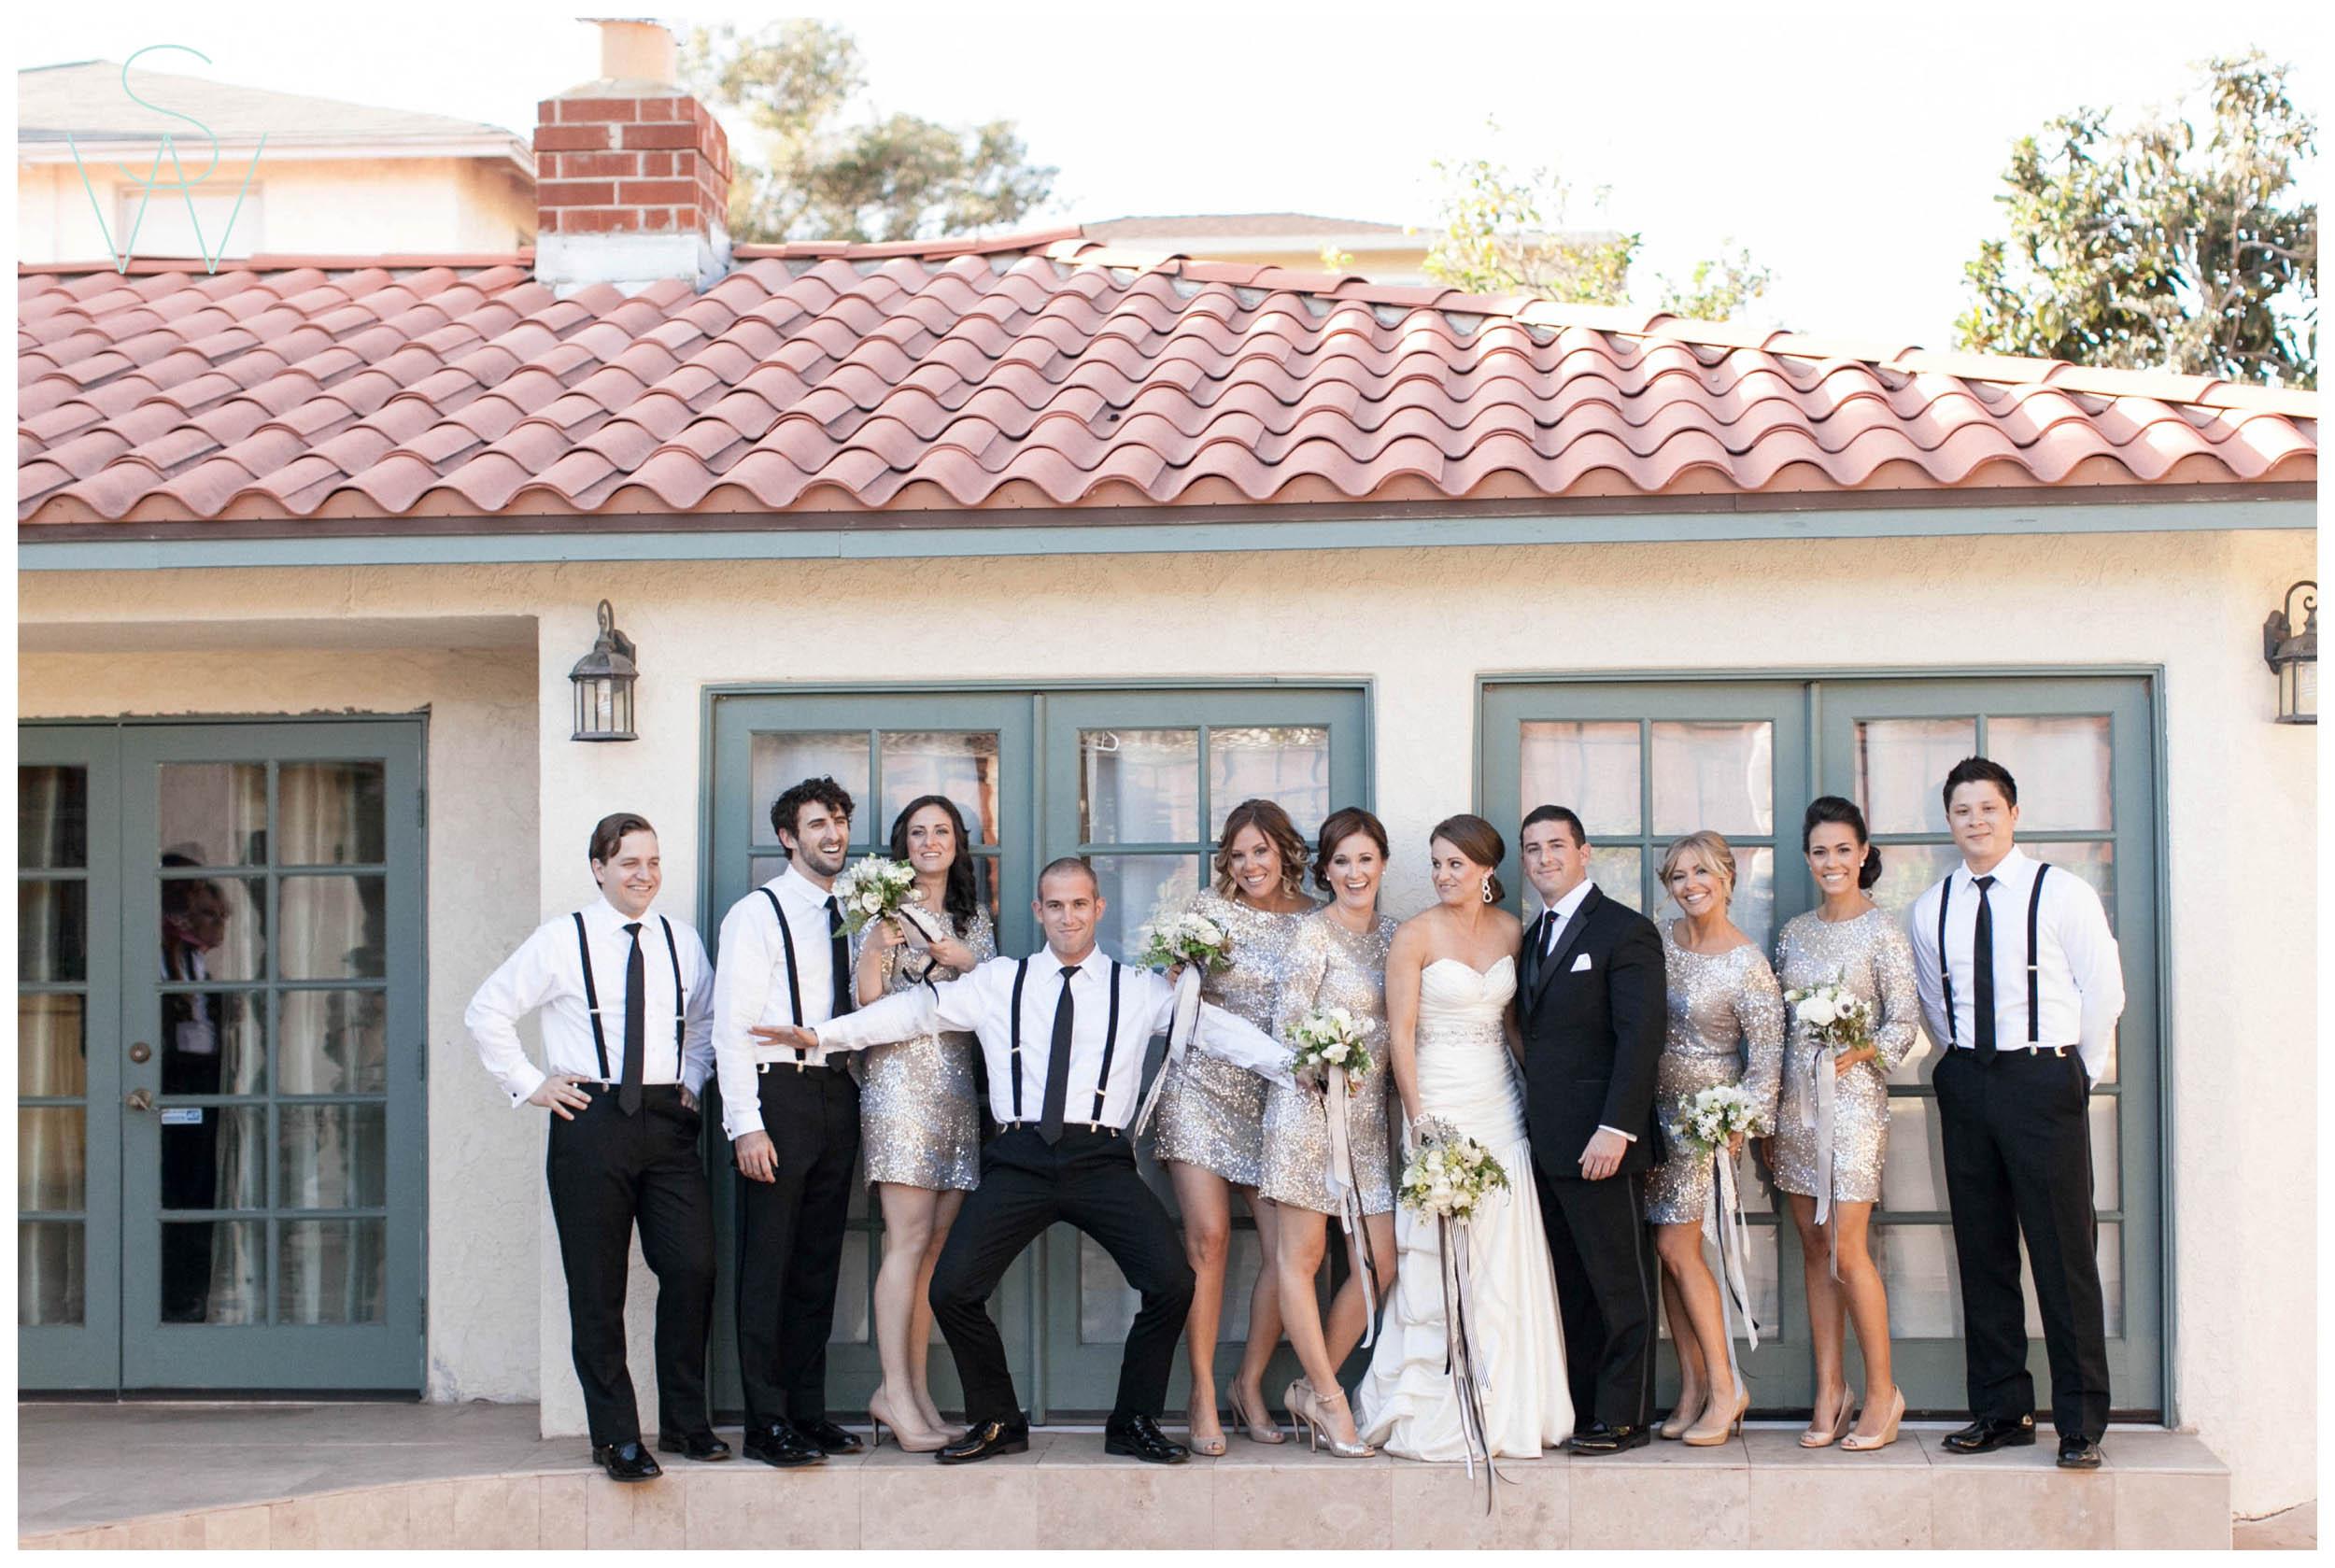 Shewanders.sdma_.wedding.photography-1022.jpg.wedding.photography-1022.jpg